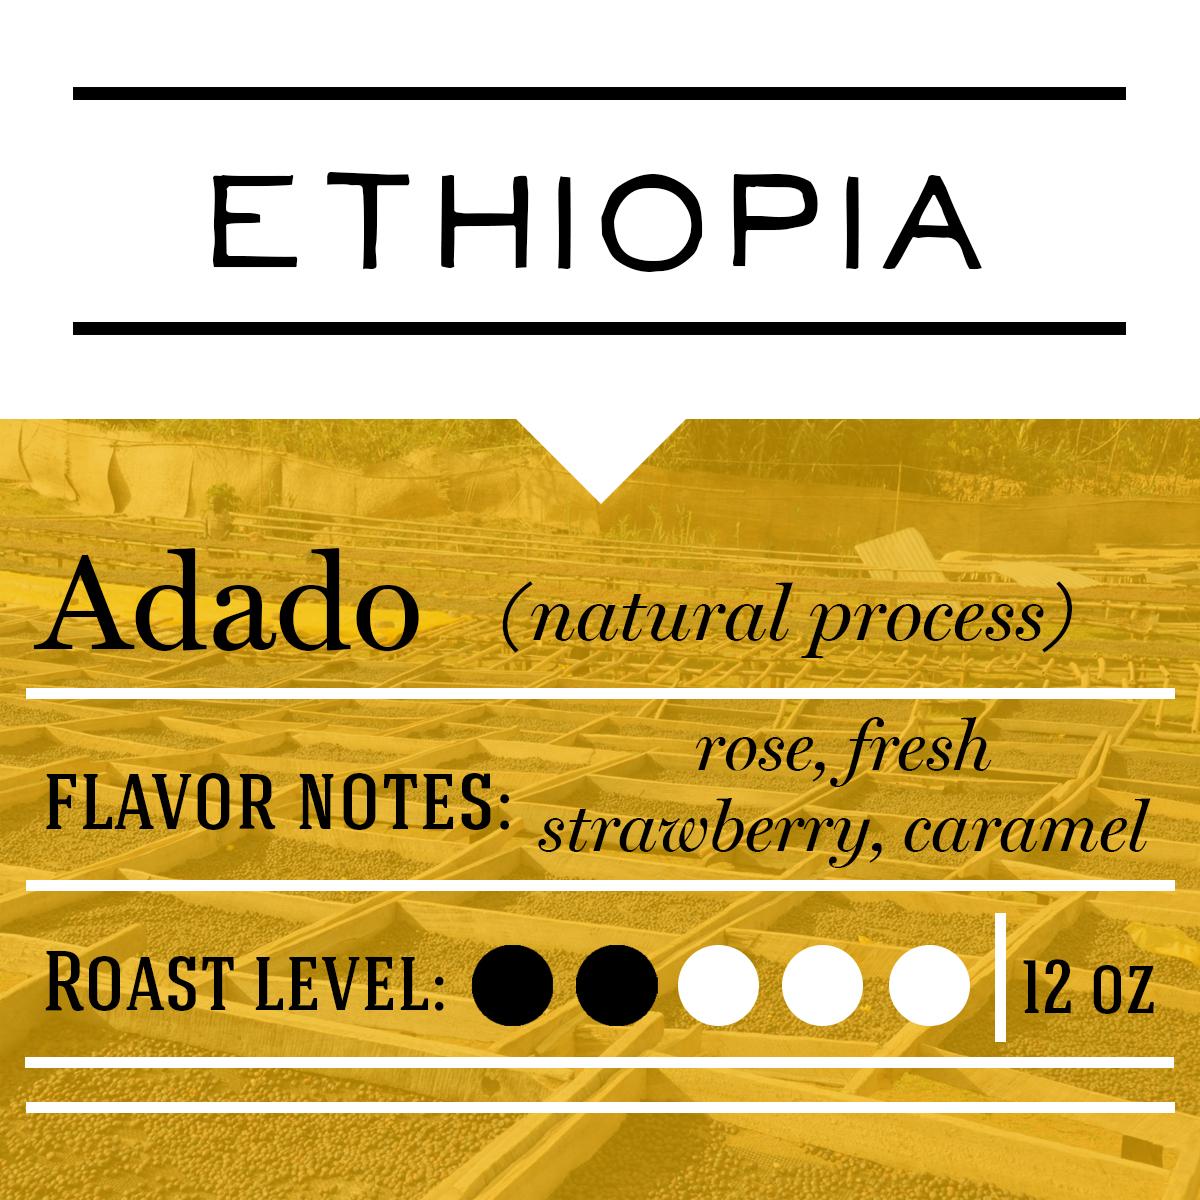 Ethiopia Idido Coffee - Patriot Coffee Roaster - Central Florida